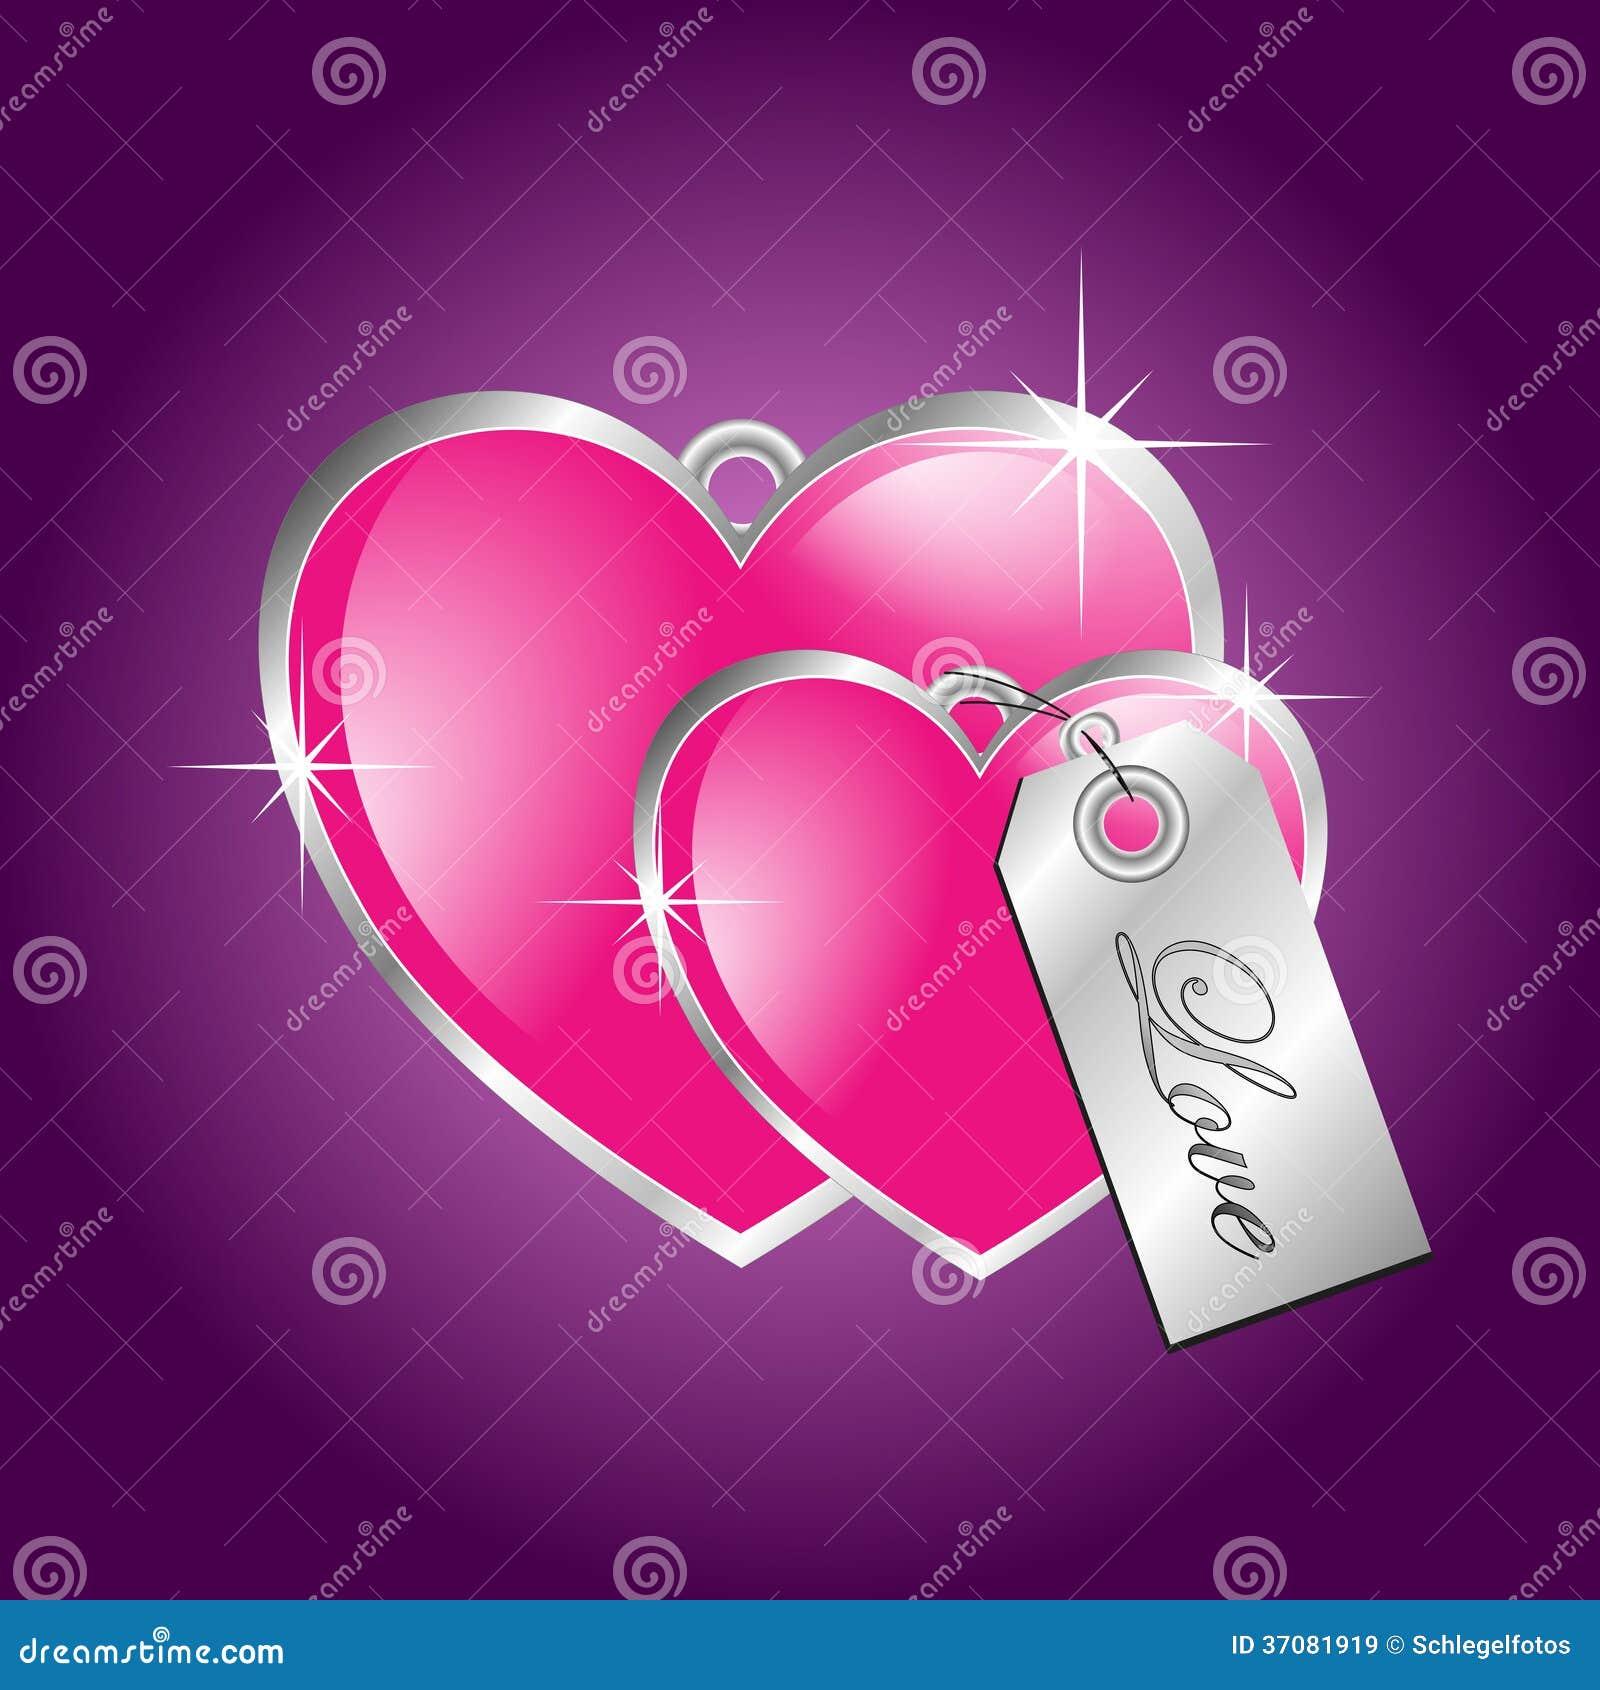 Pink hearts on purple background stock illustration illustration pink hearts on purple background buycottarizona